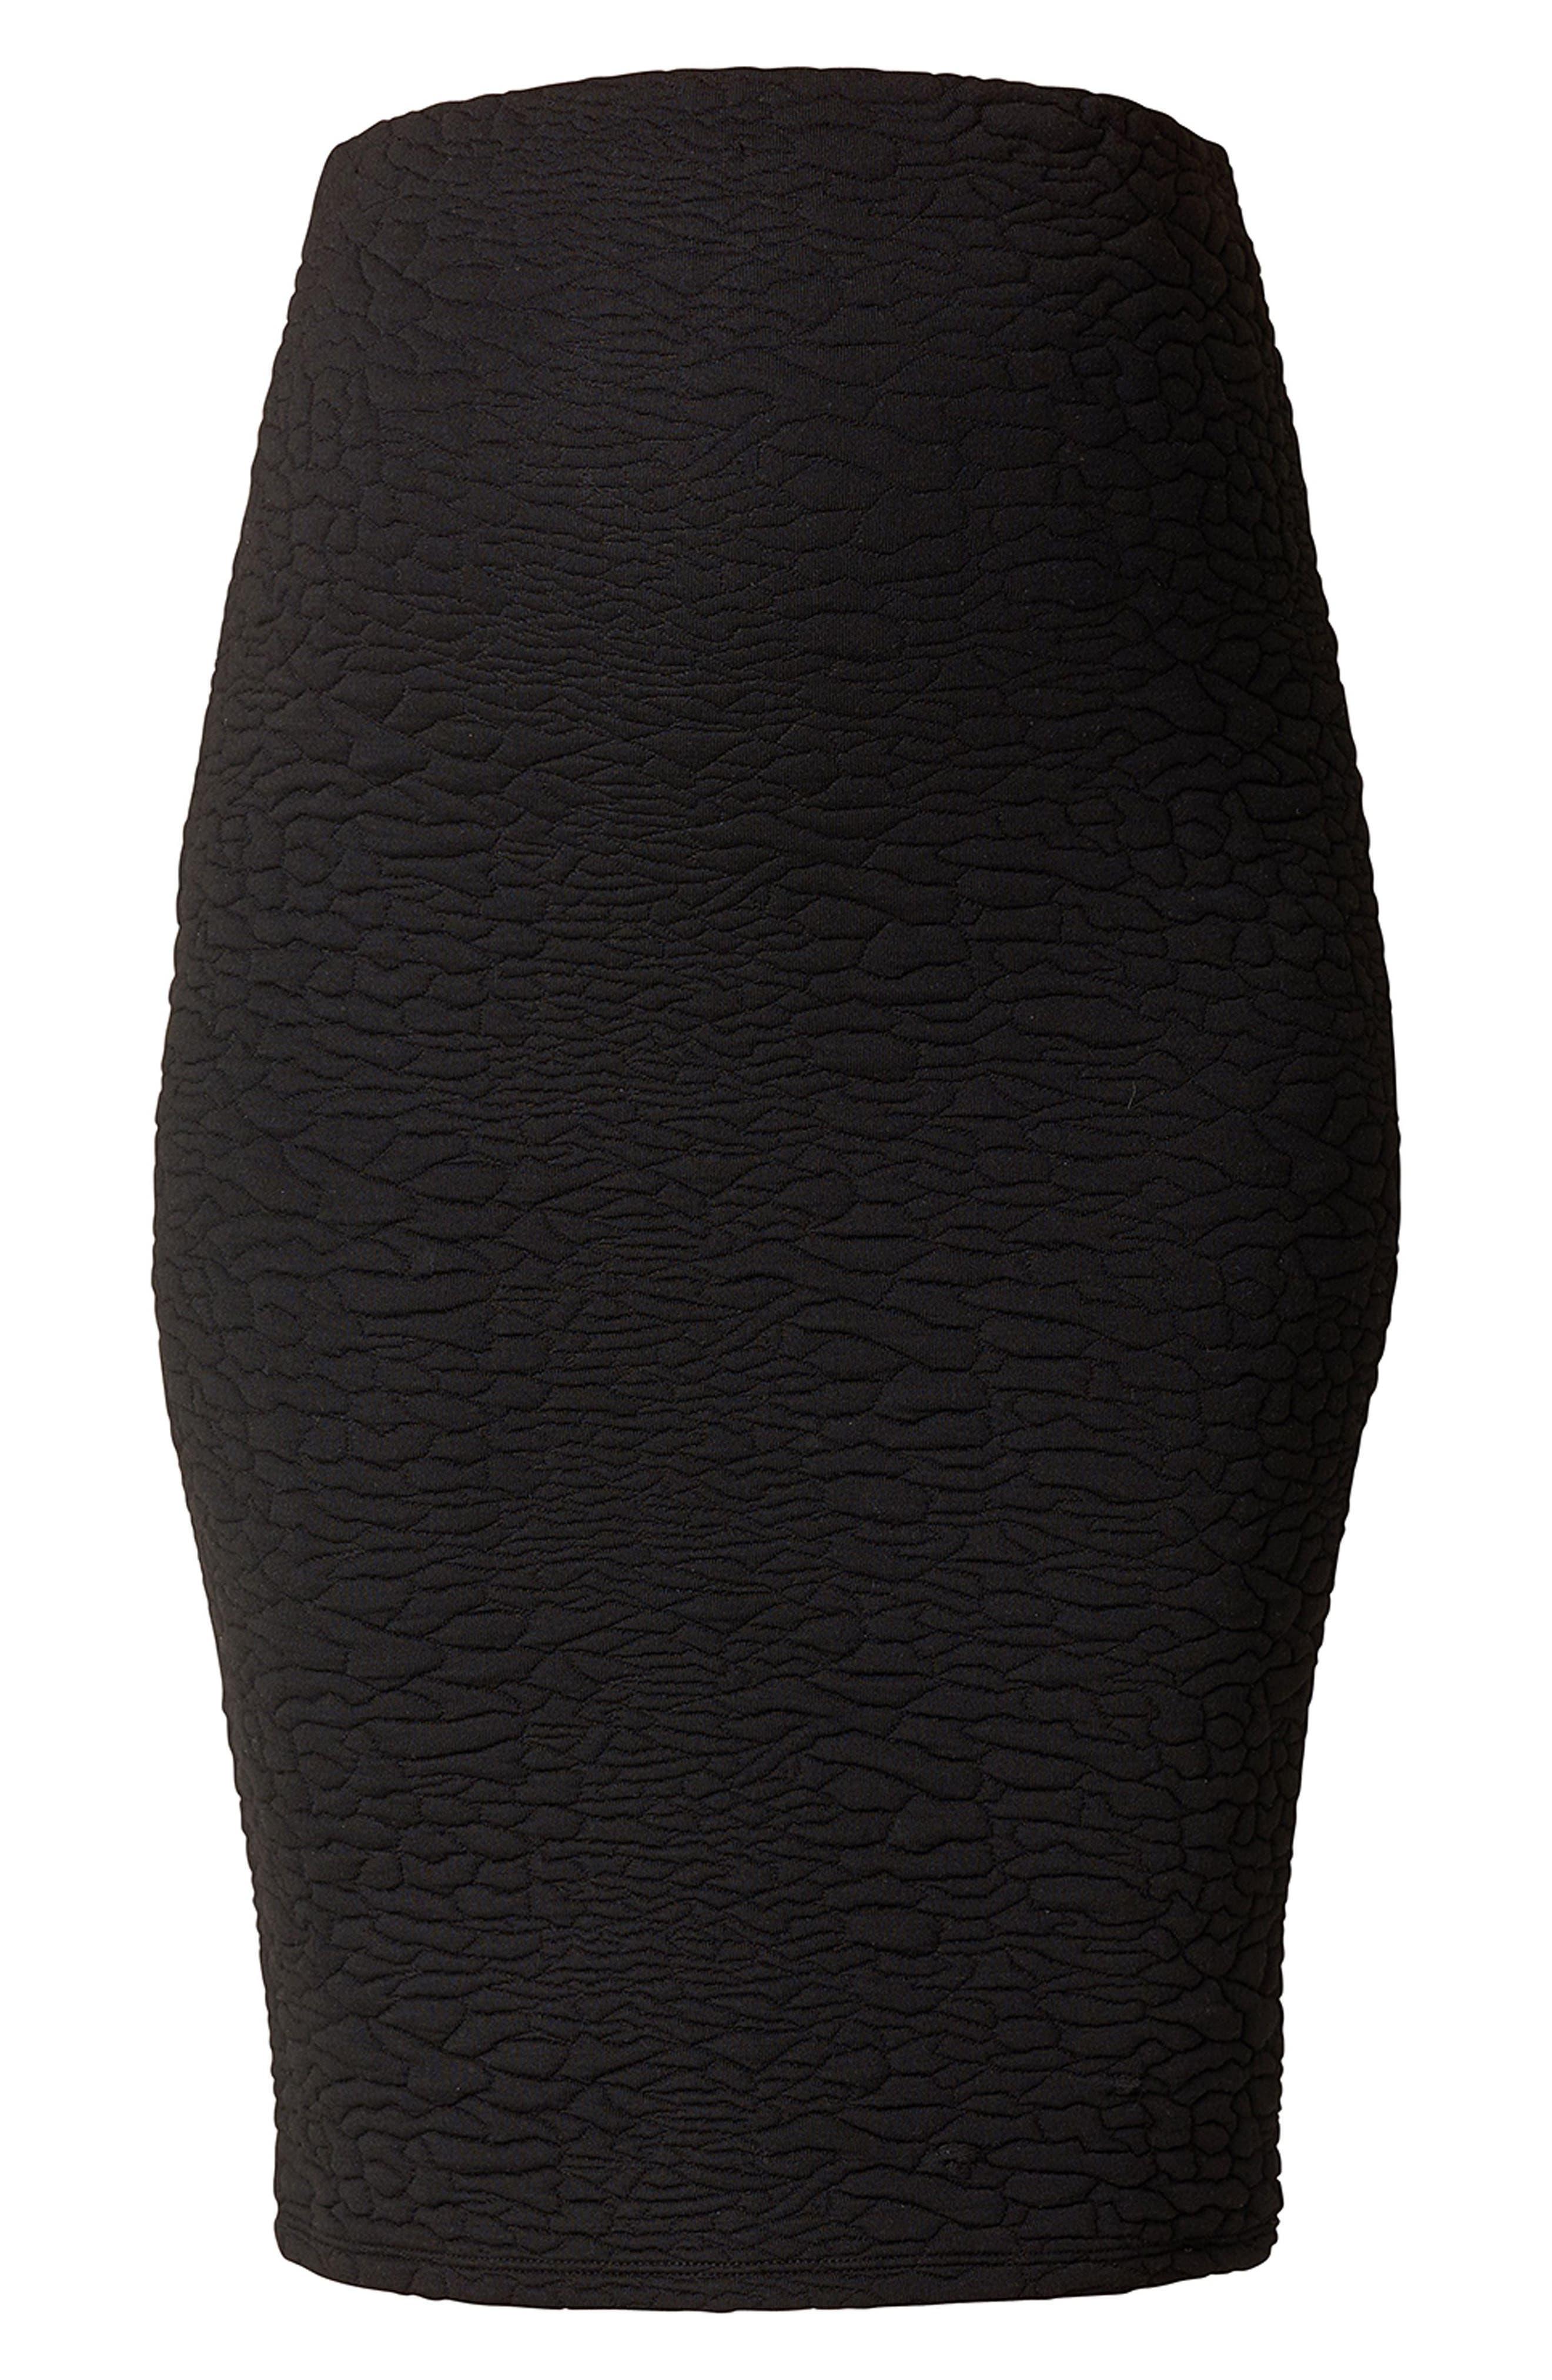 Main Image - Noppies Jane Textured Knit Maternity Skirt